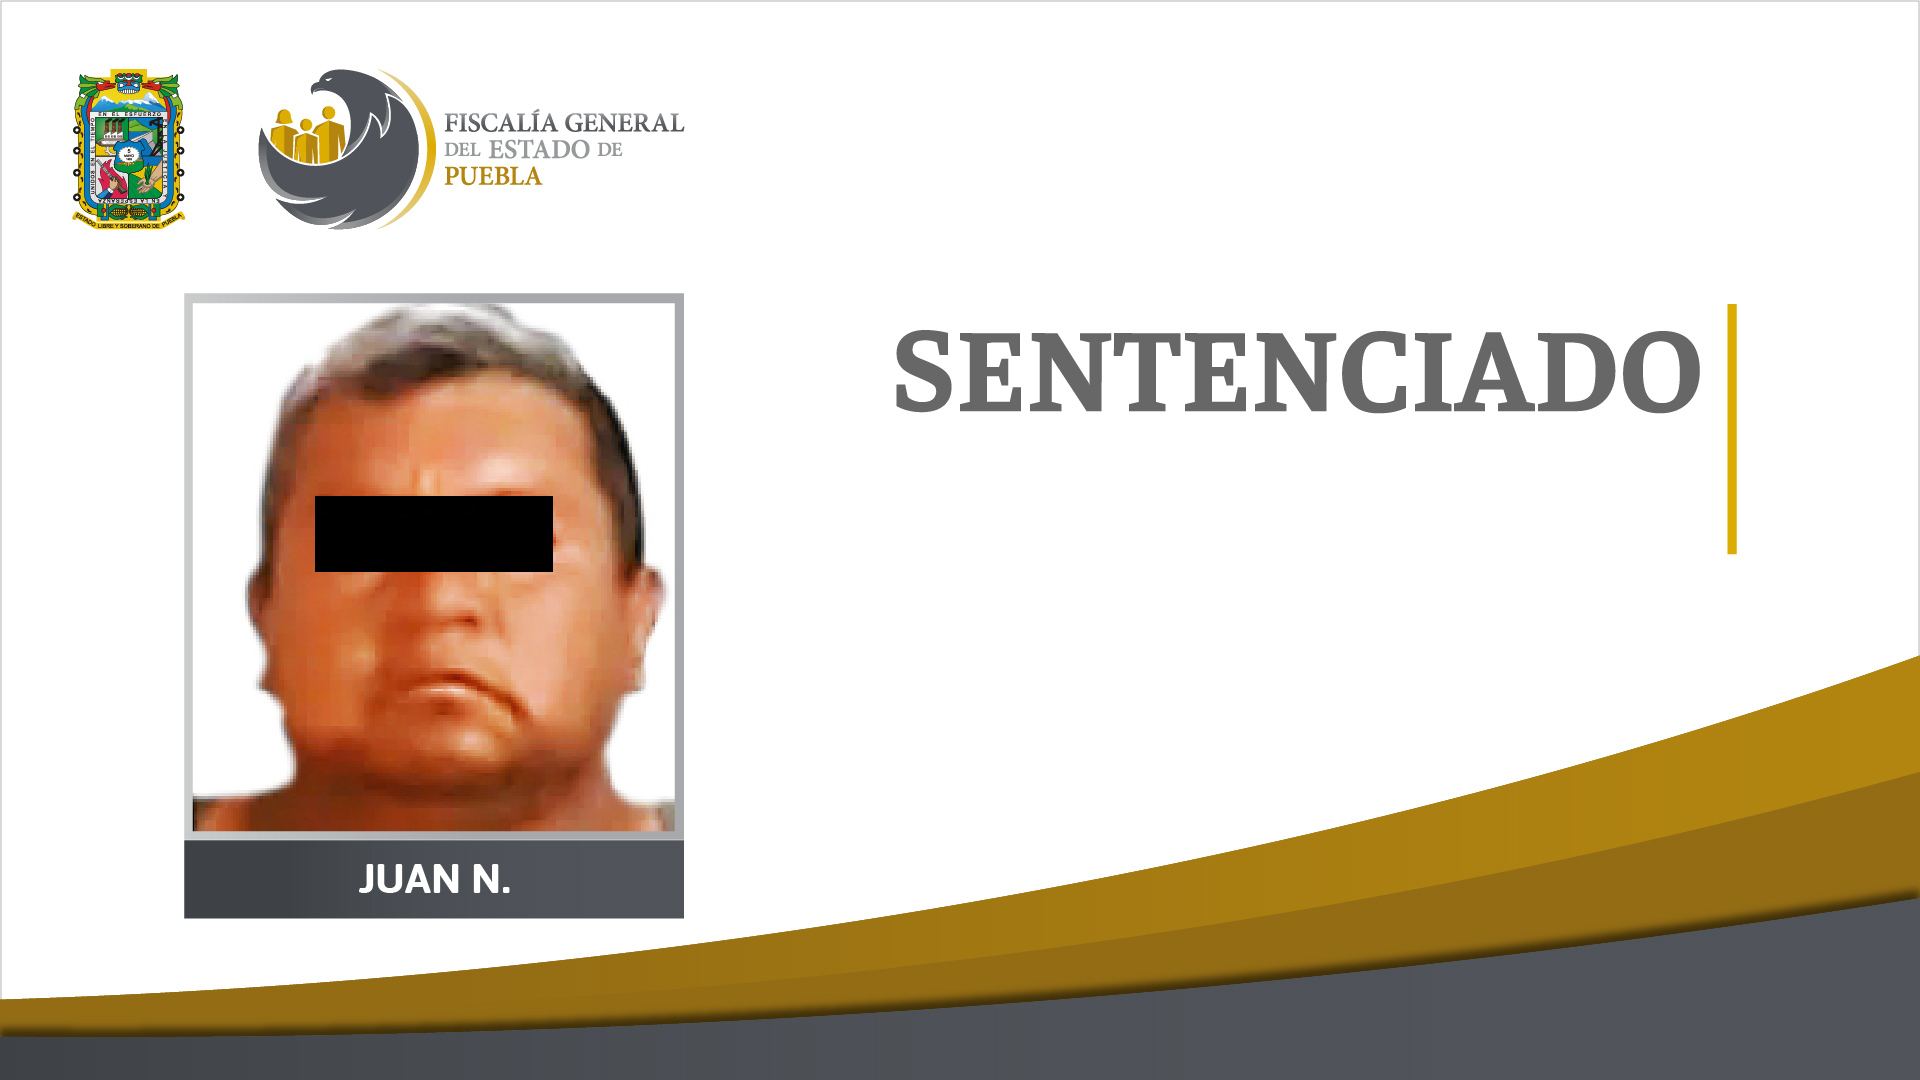 Le dan 23 años de cárcel a Juan por matar un hombre en Tehuacán